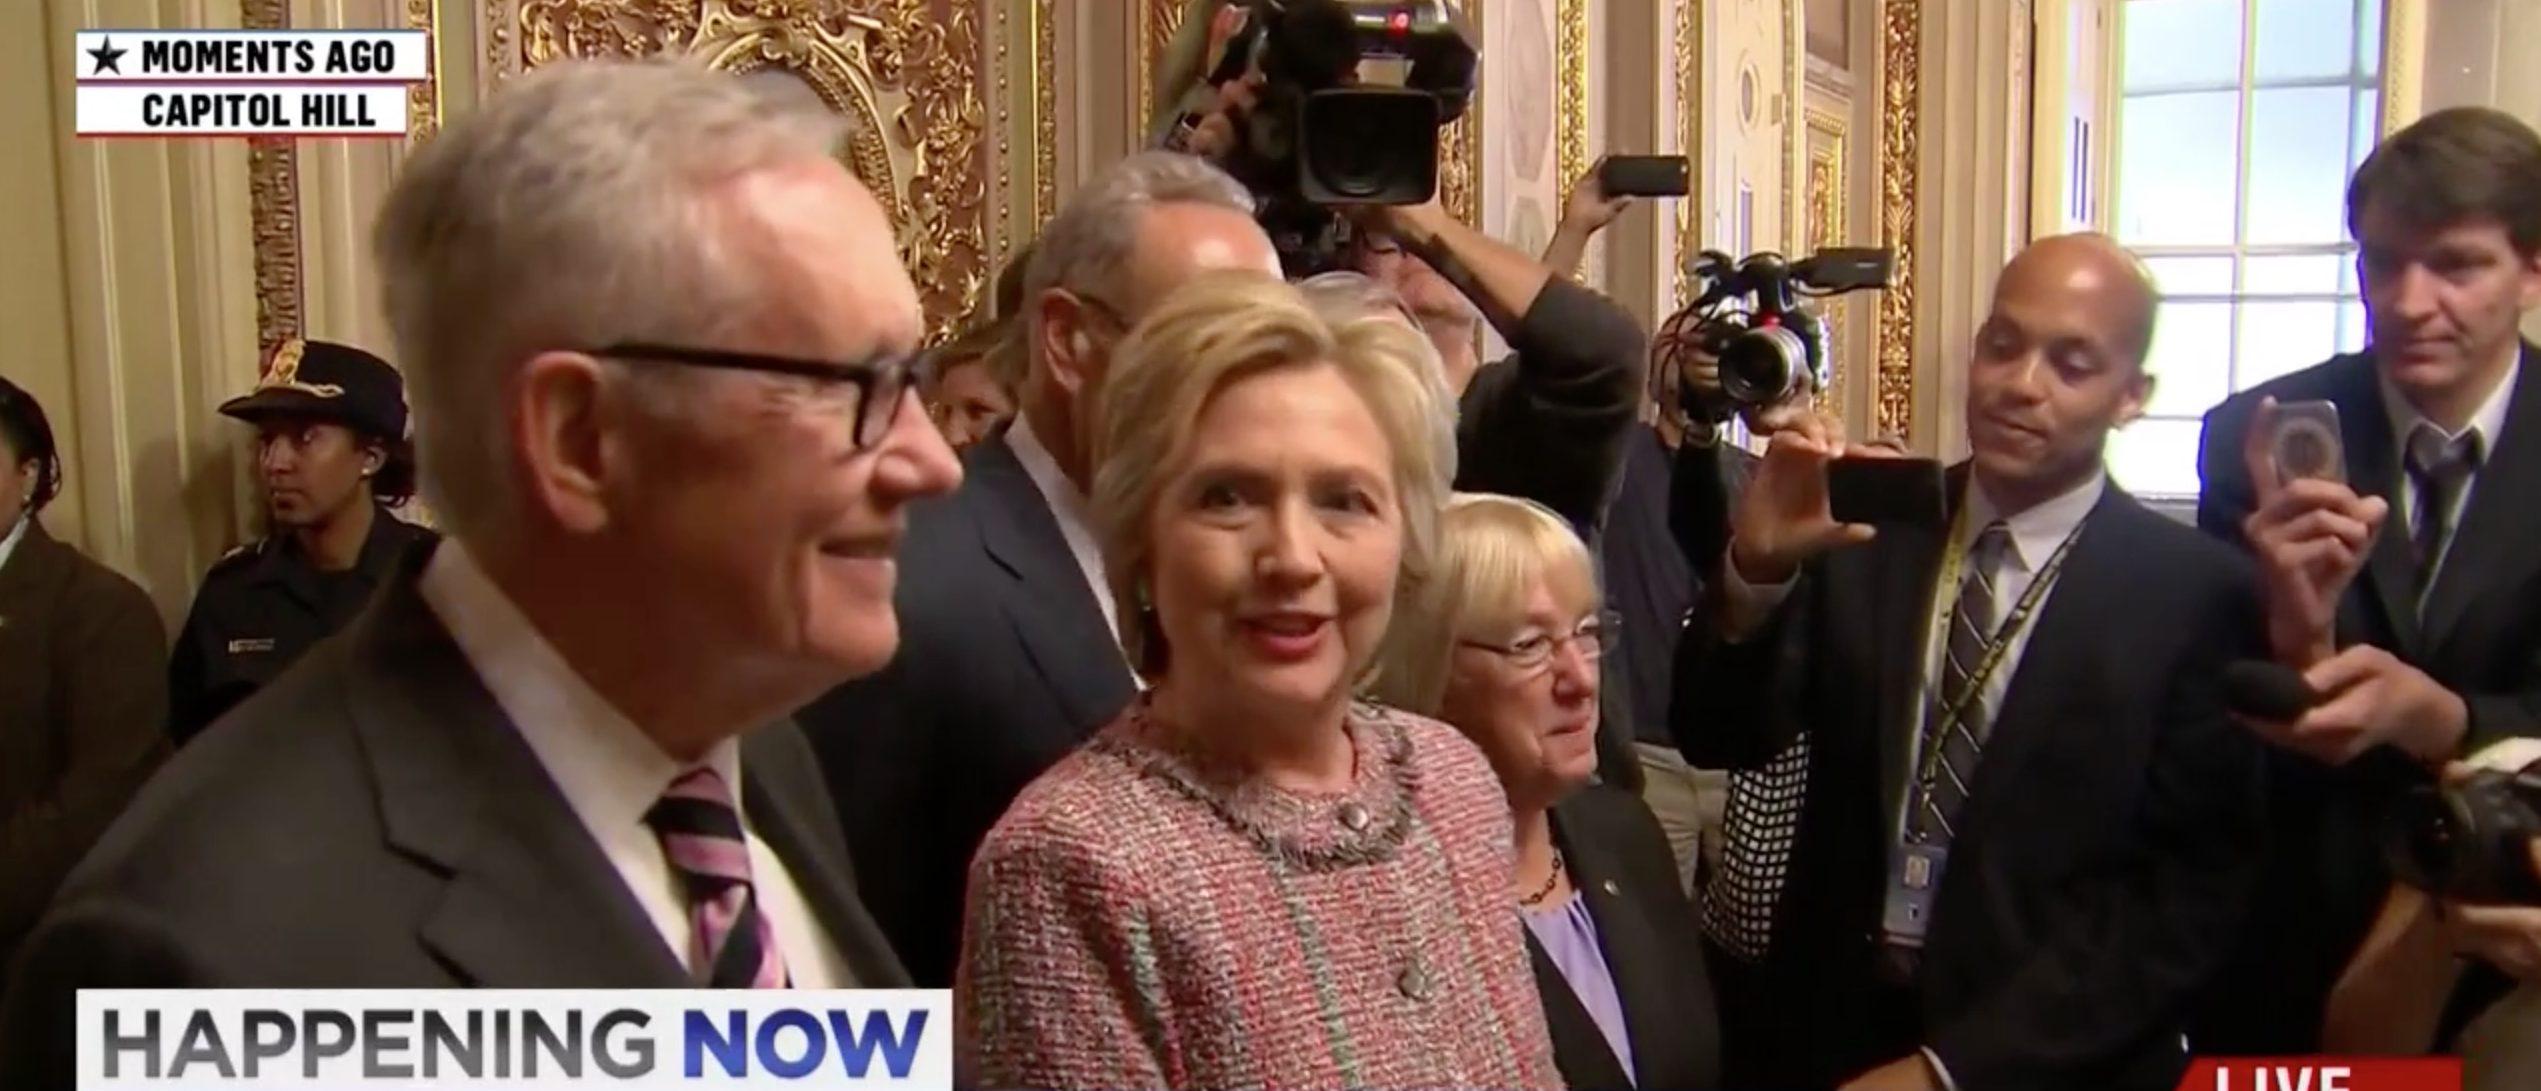 Hillary Clinton, Screen Grab MSNBC, 7-14-2016